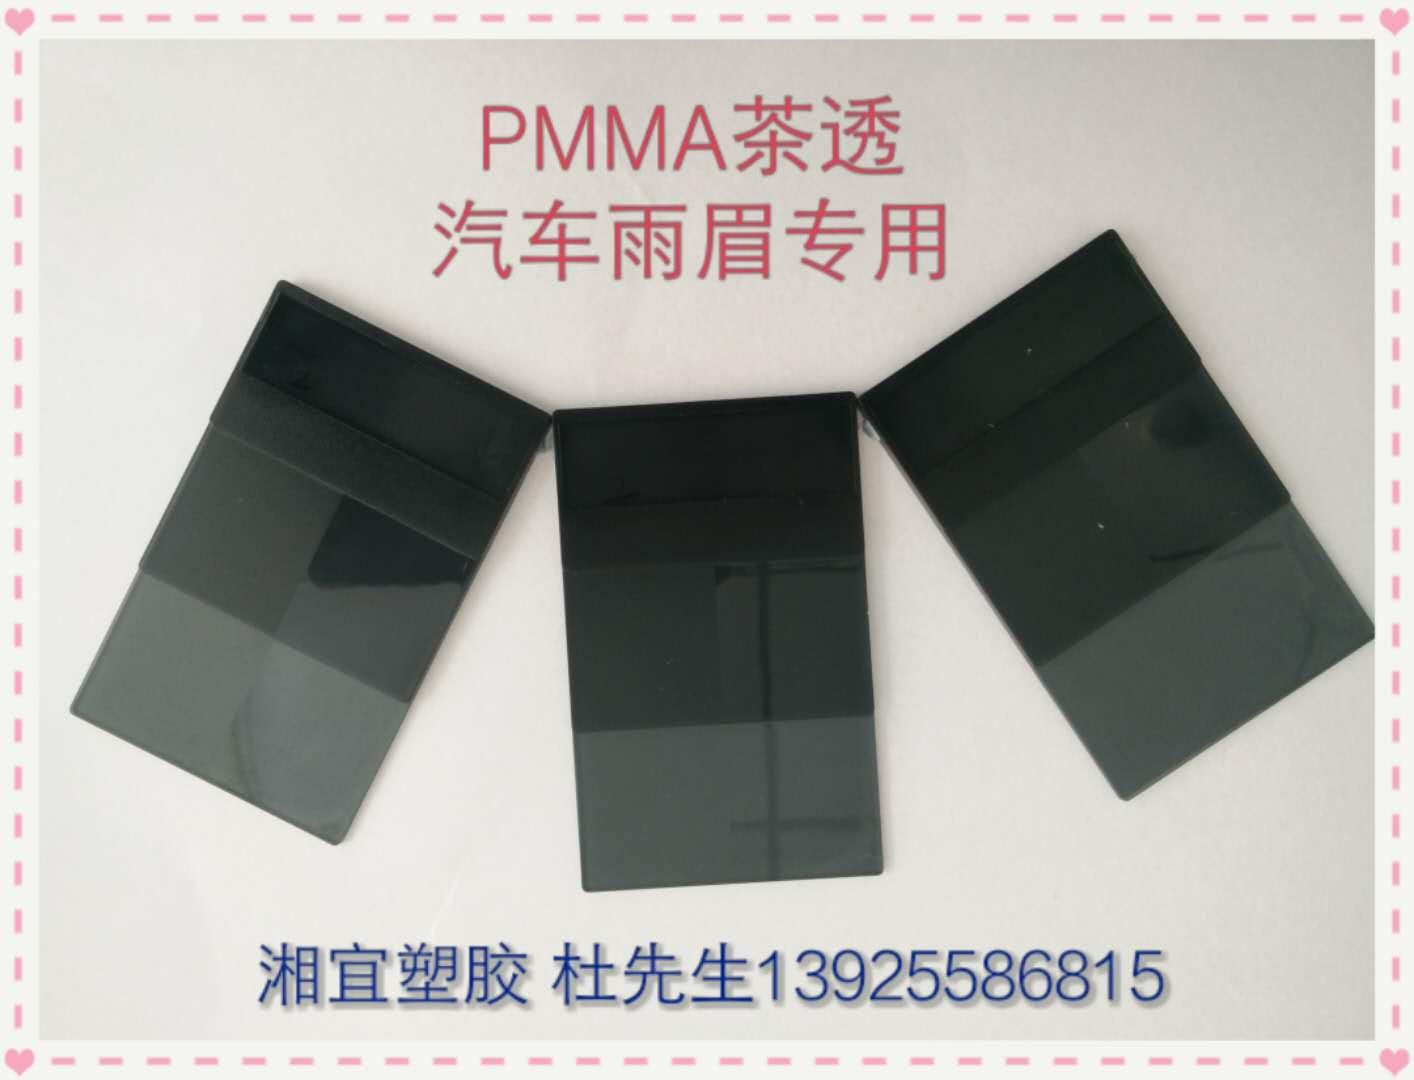 PMMA茶透汽车雨眉专用